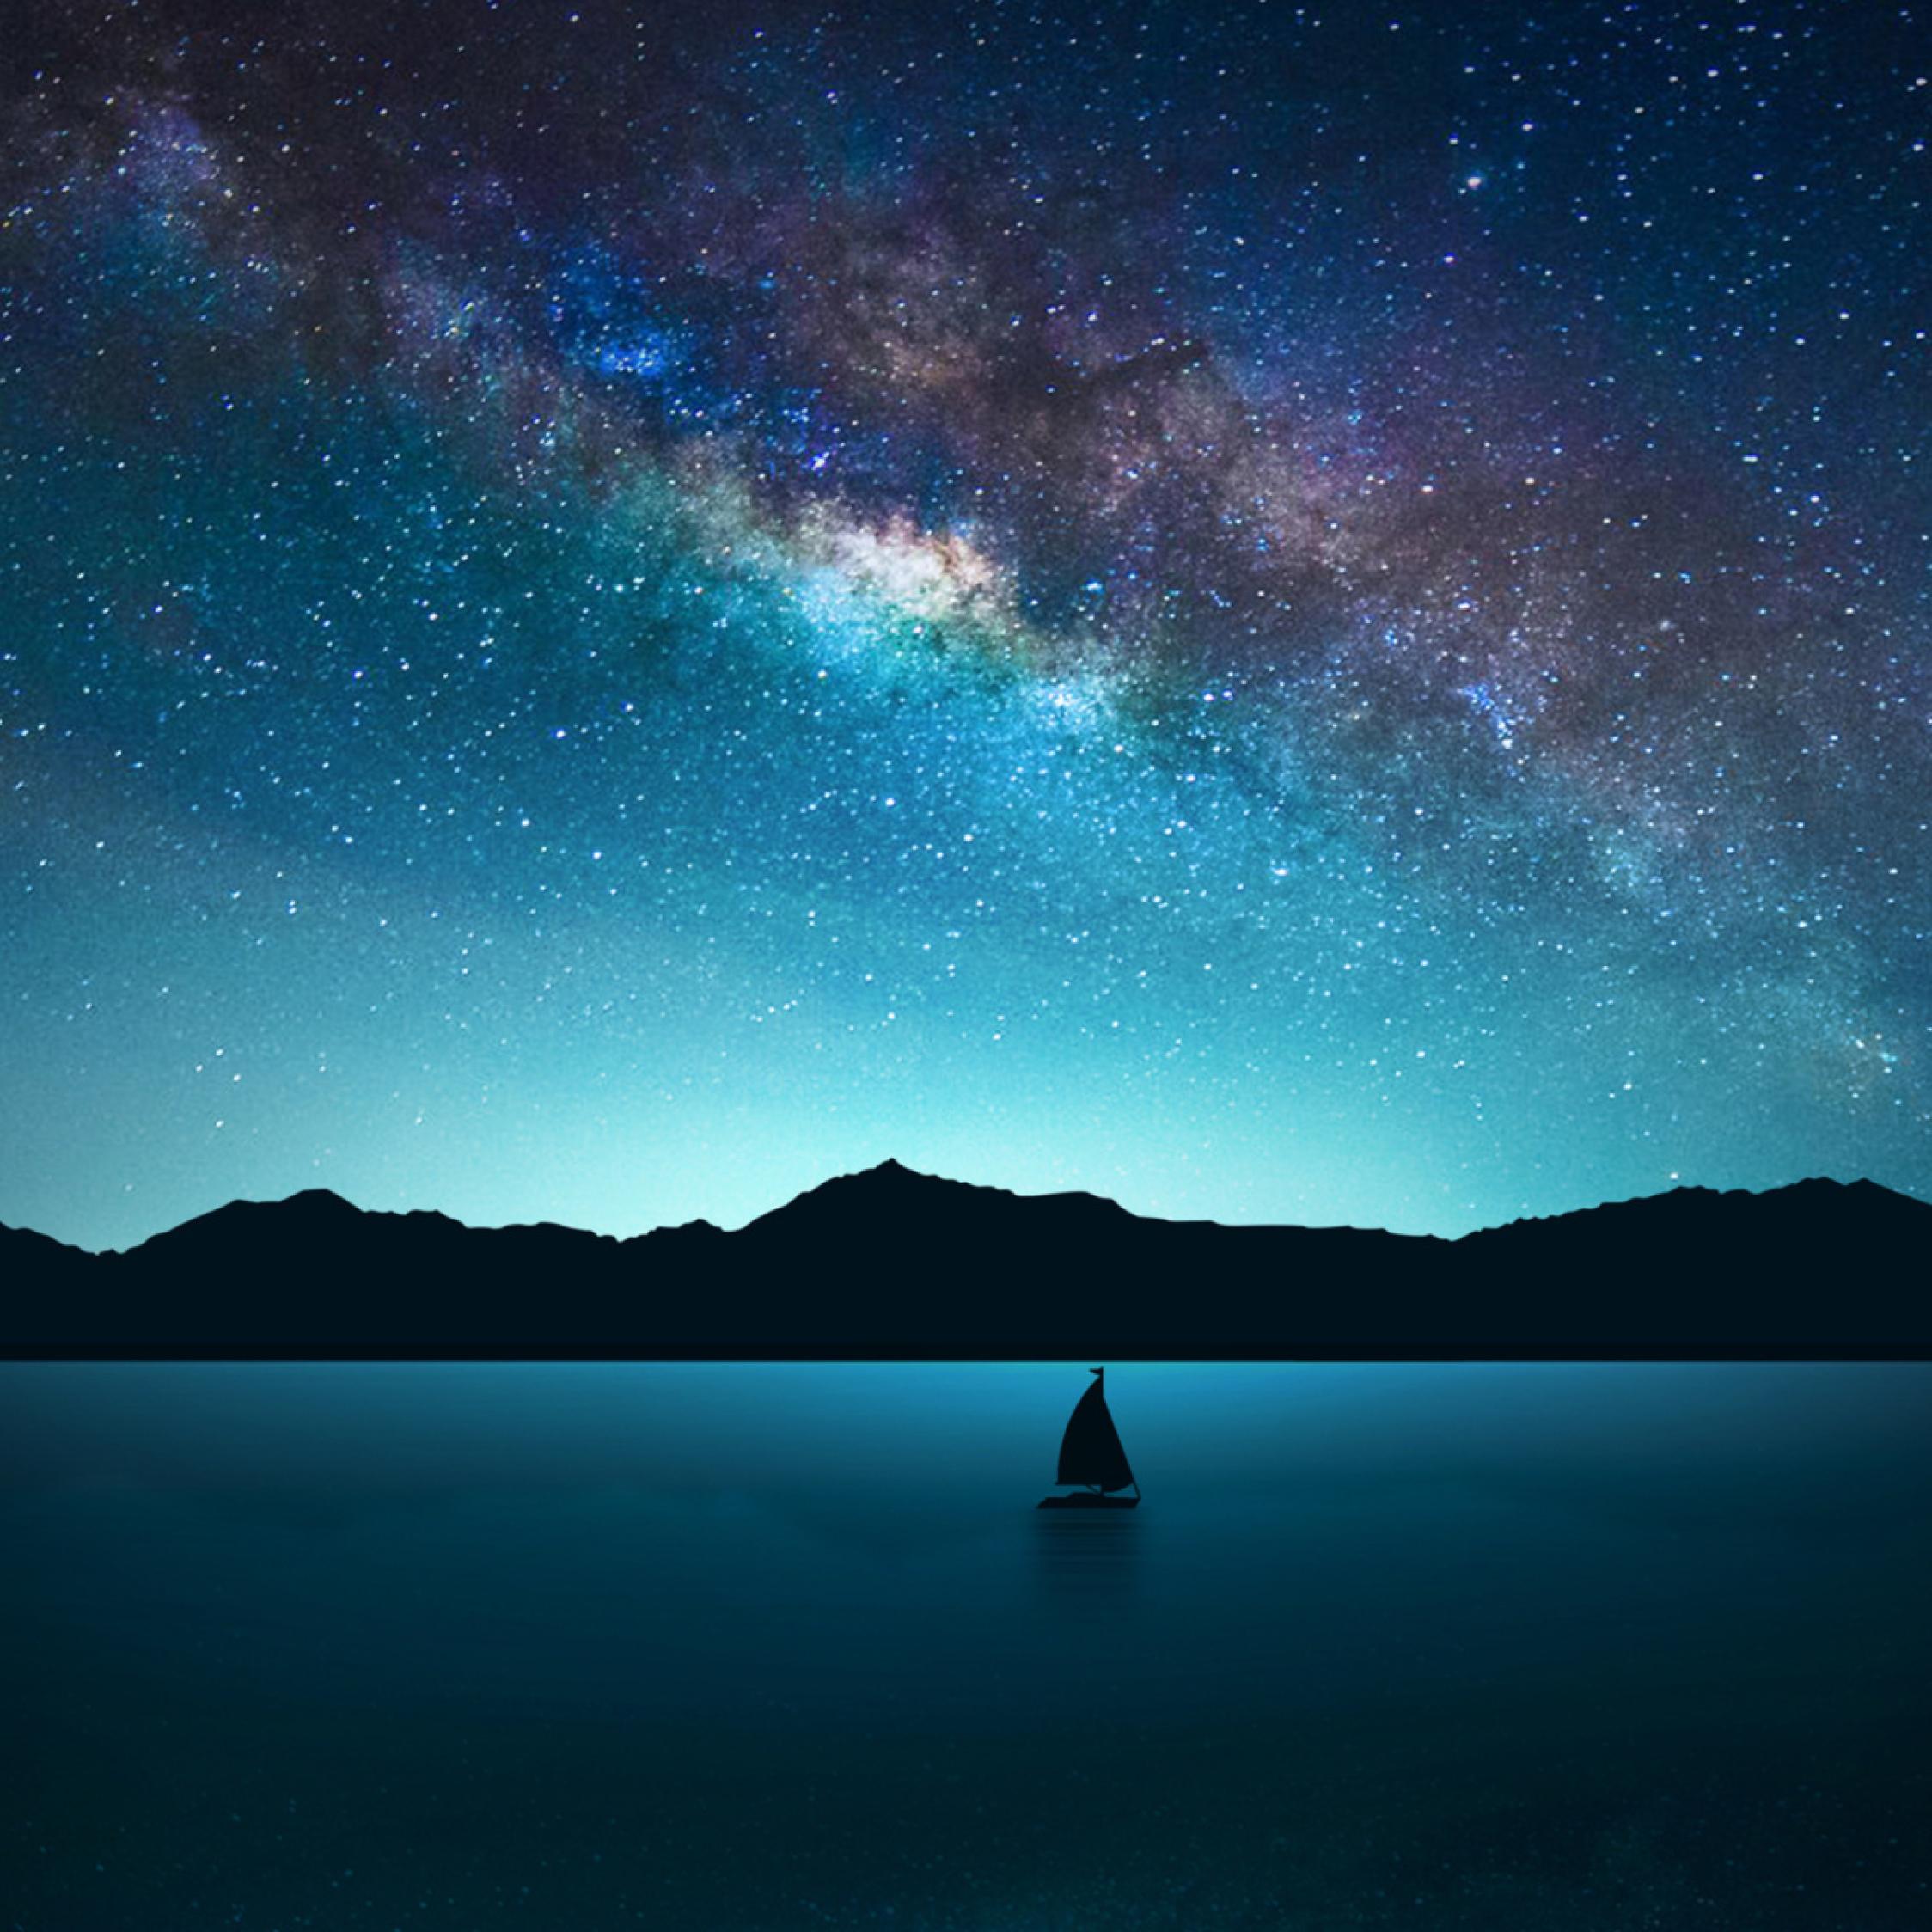 Milky Way Wallpaper: Download Lone Sailboat On Milky Way Night 1080x1920